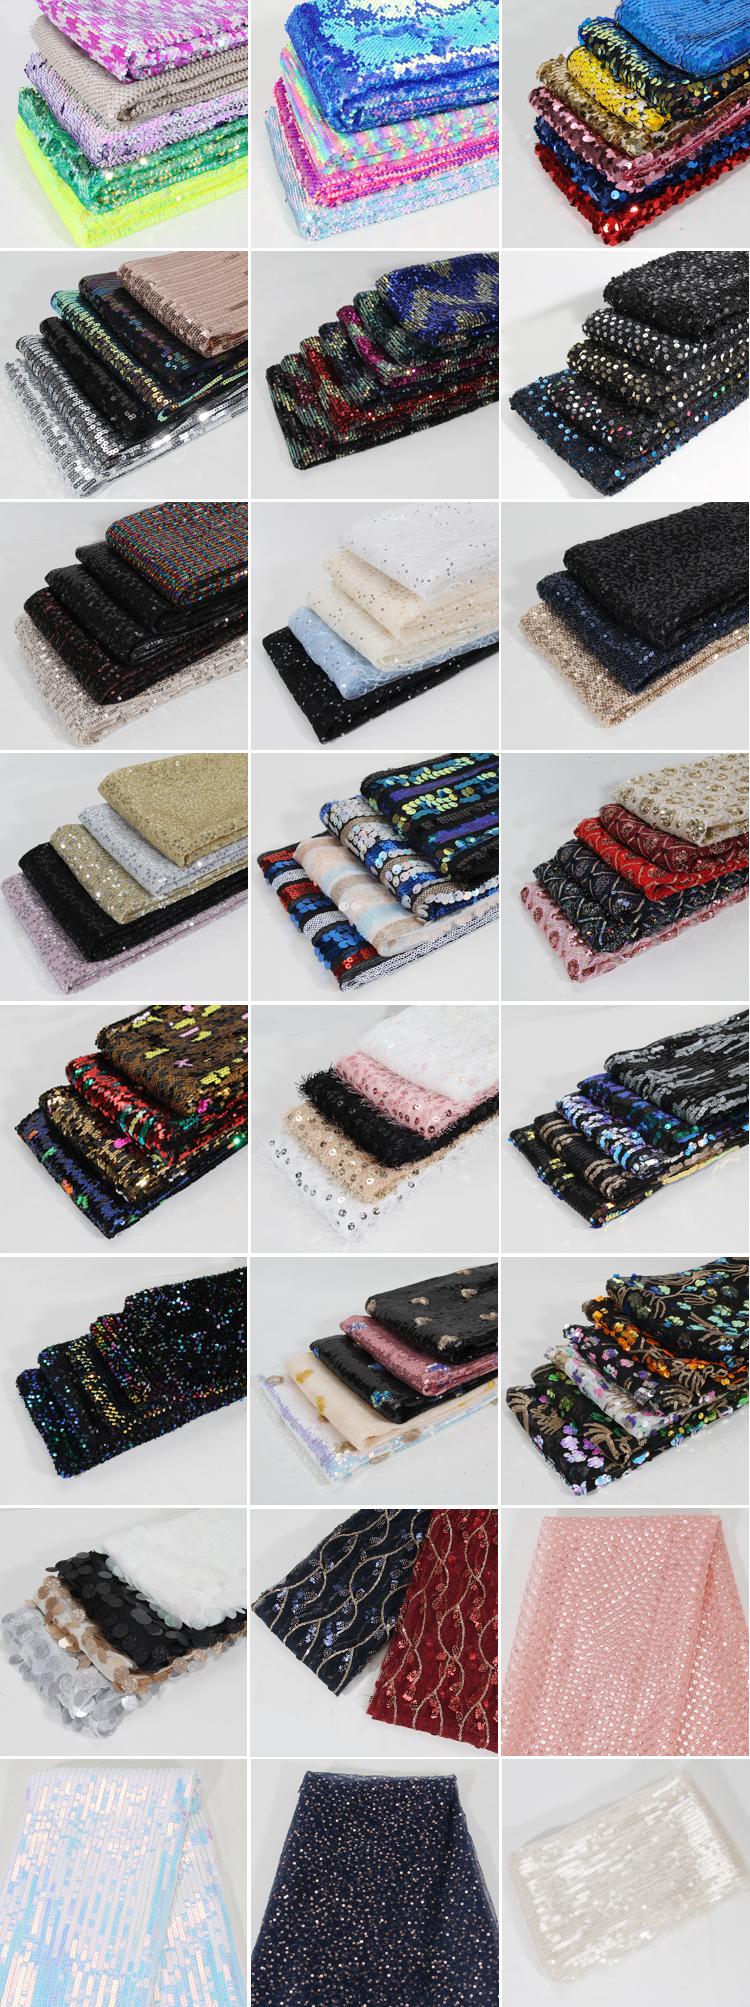 Berkilauan Peregangan Poliester Mesh Dasar Ular Payet Kain untuk Home Textile